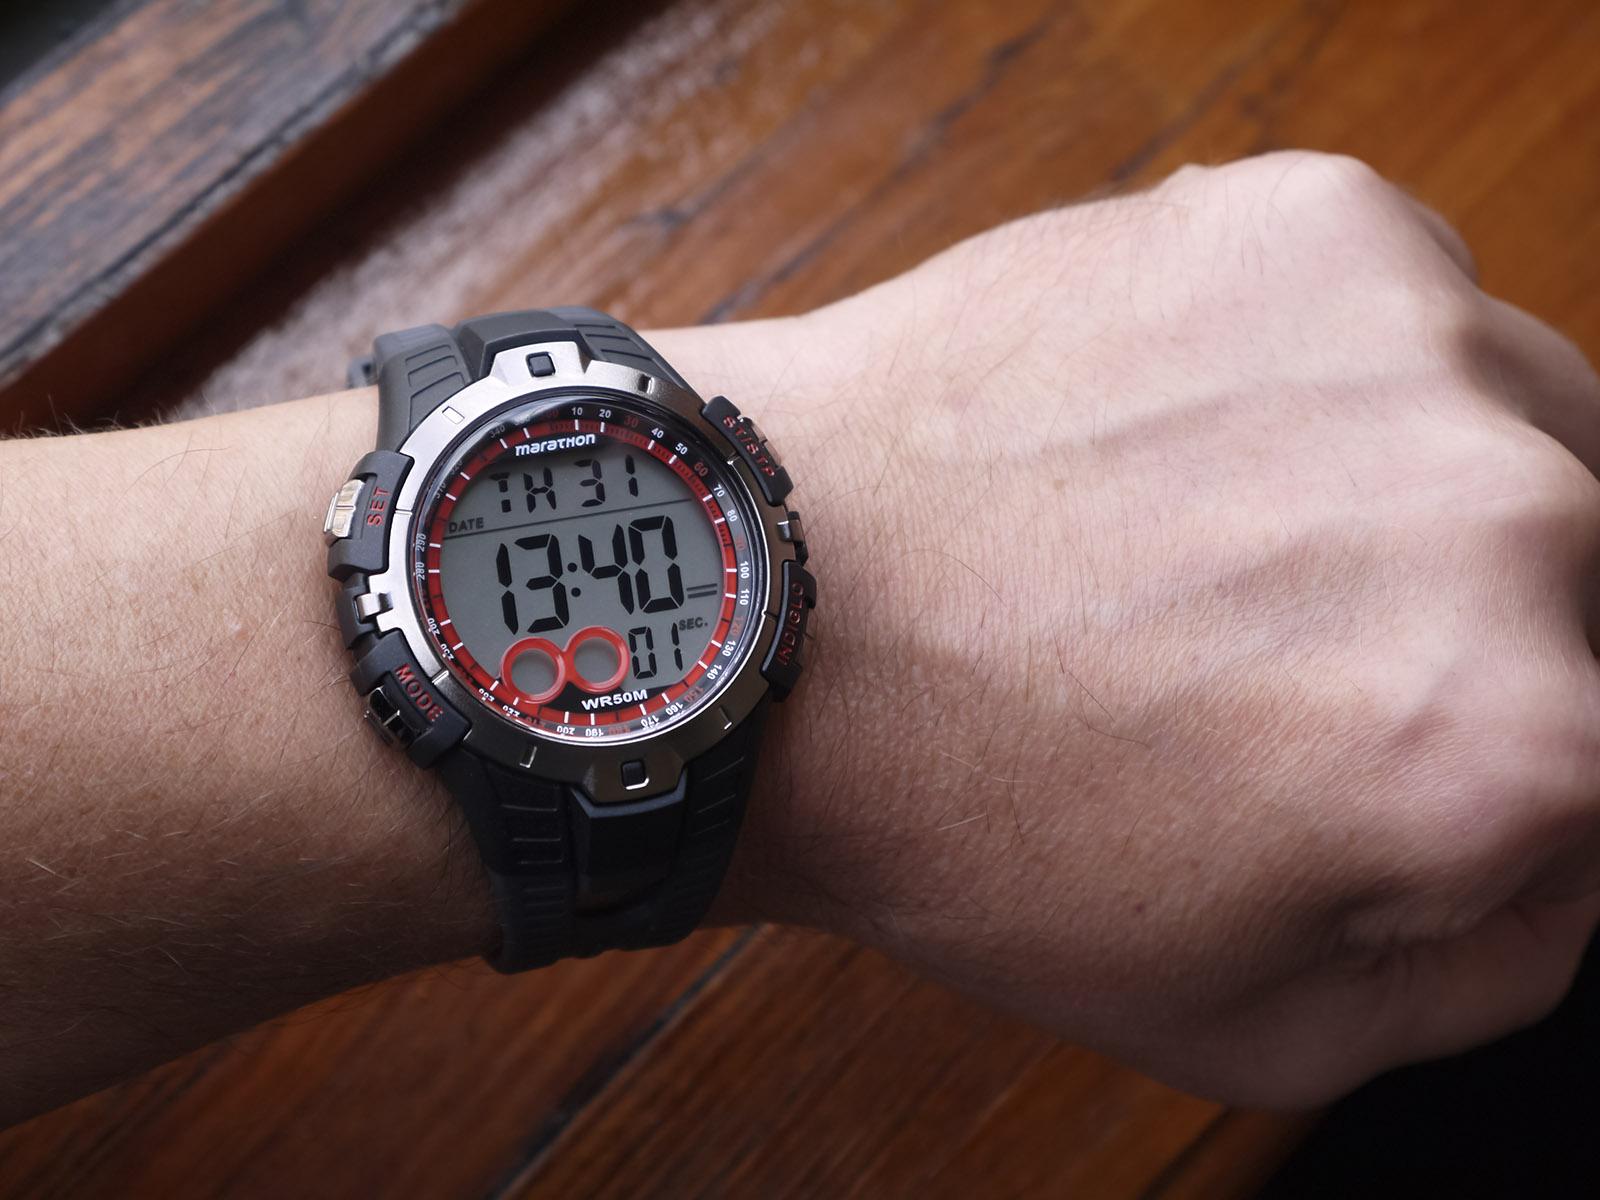 Timex T5K423 Marathon Watch  High Quality Watch Gallery-4878